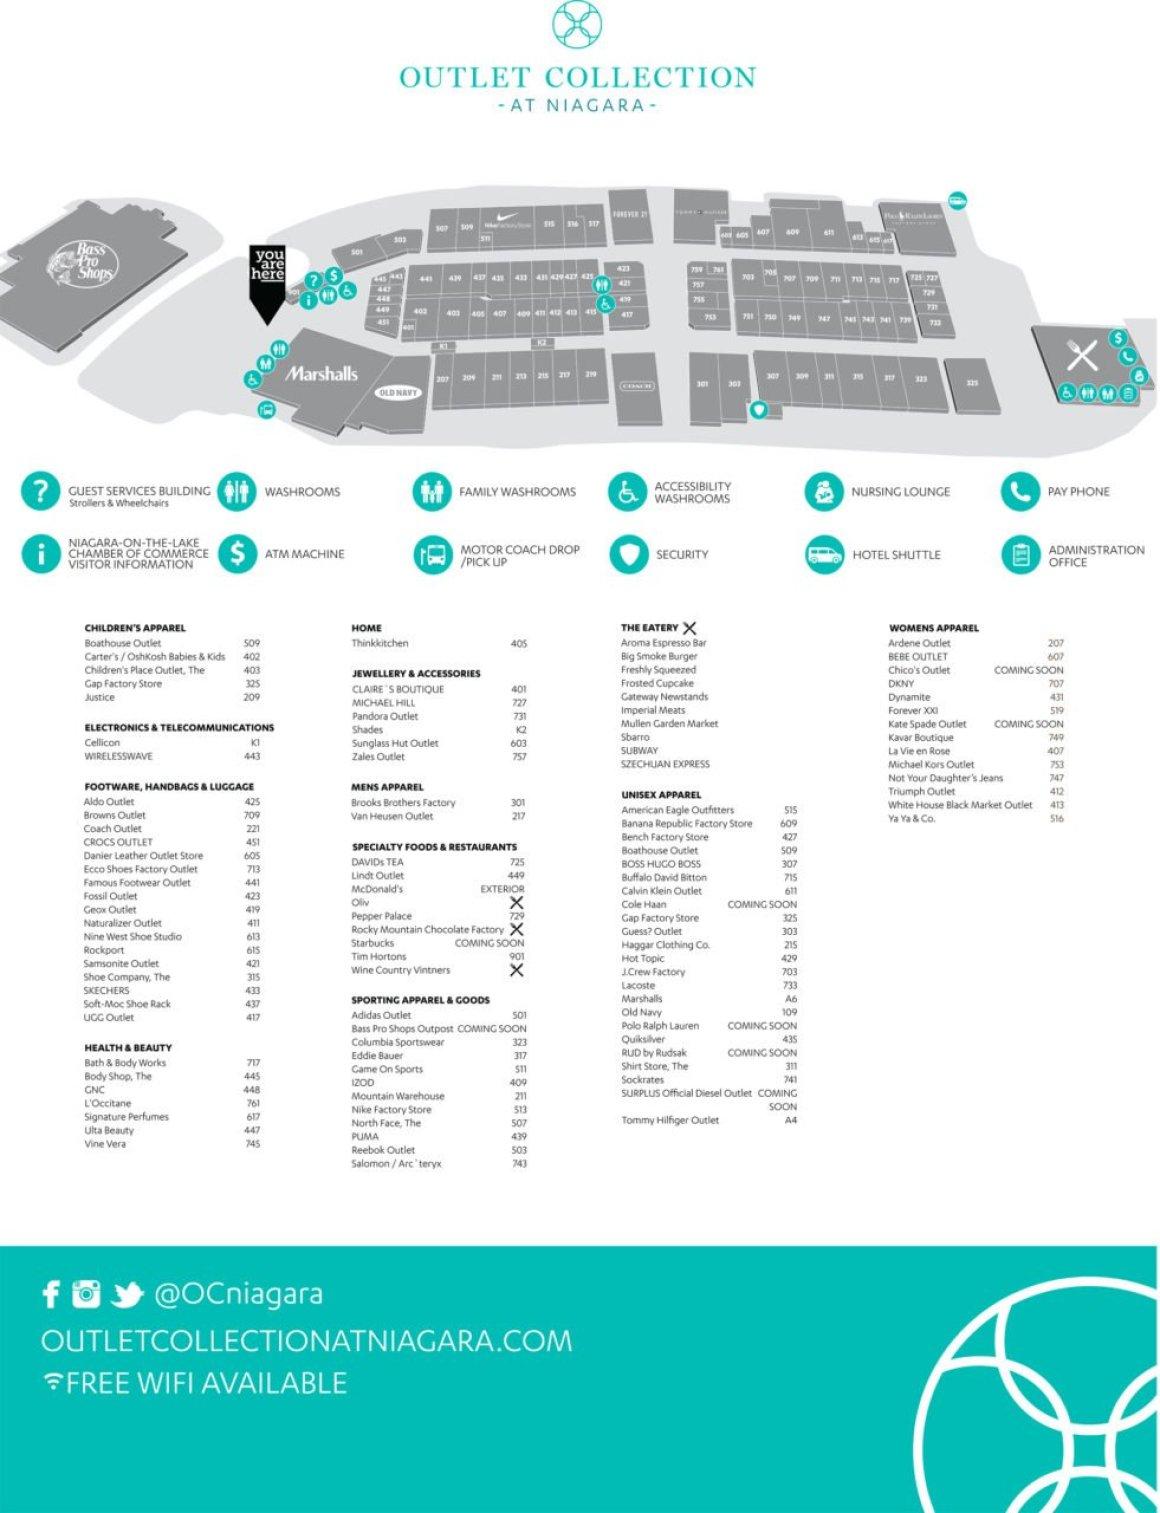 OCON Store Directory